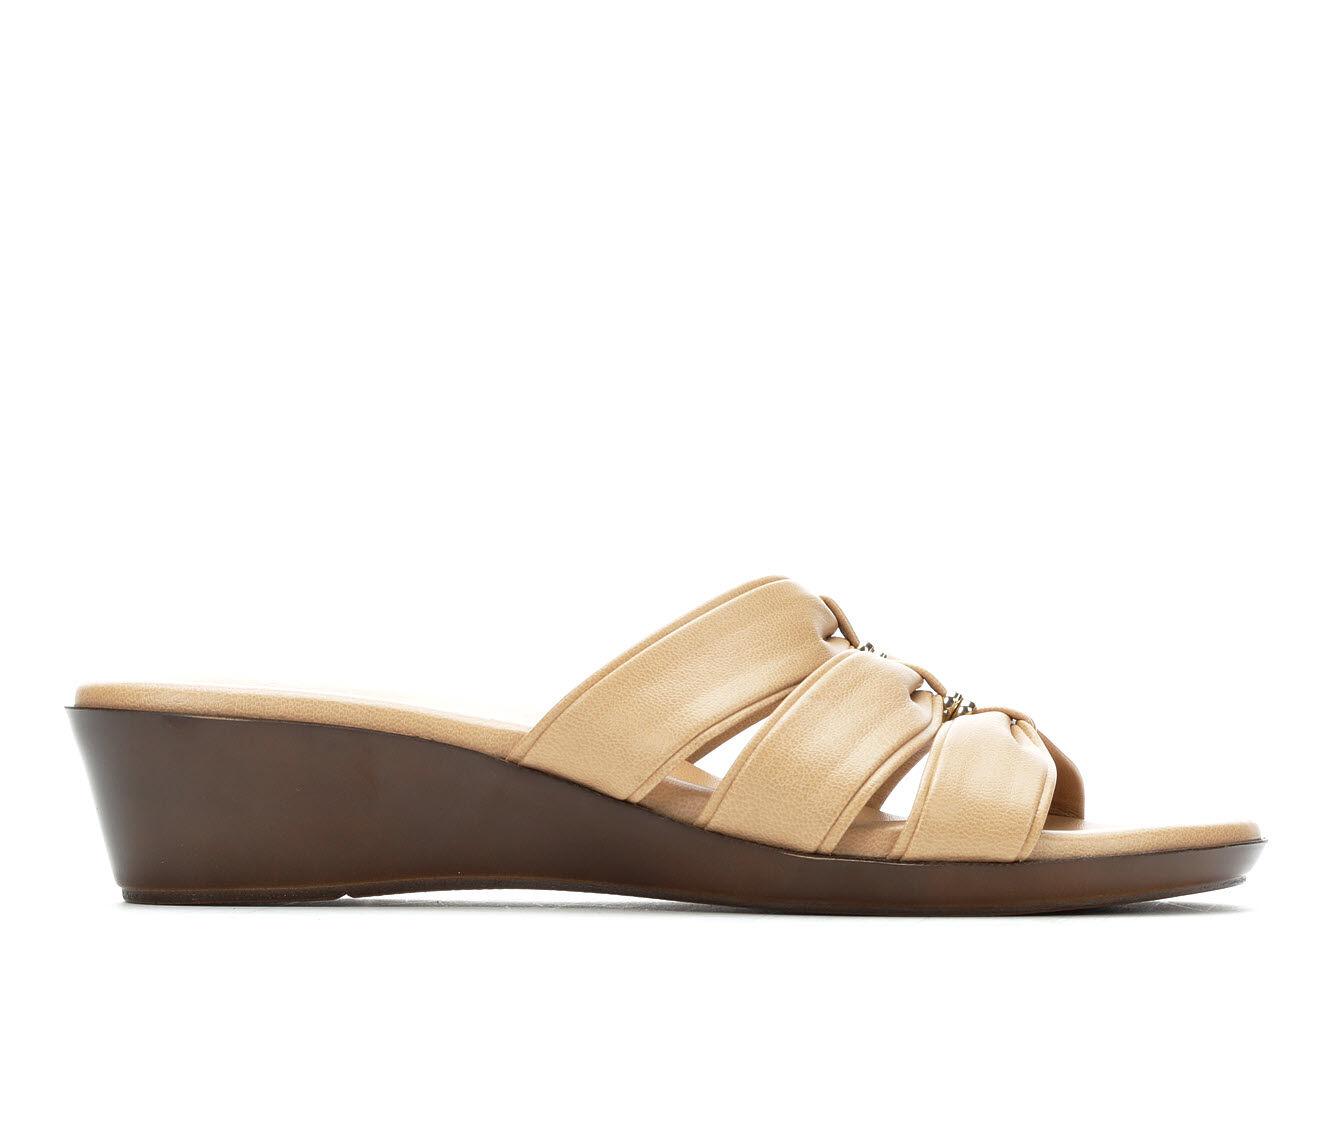 uk shoes_kd6401